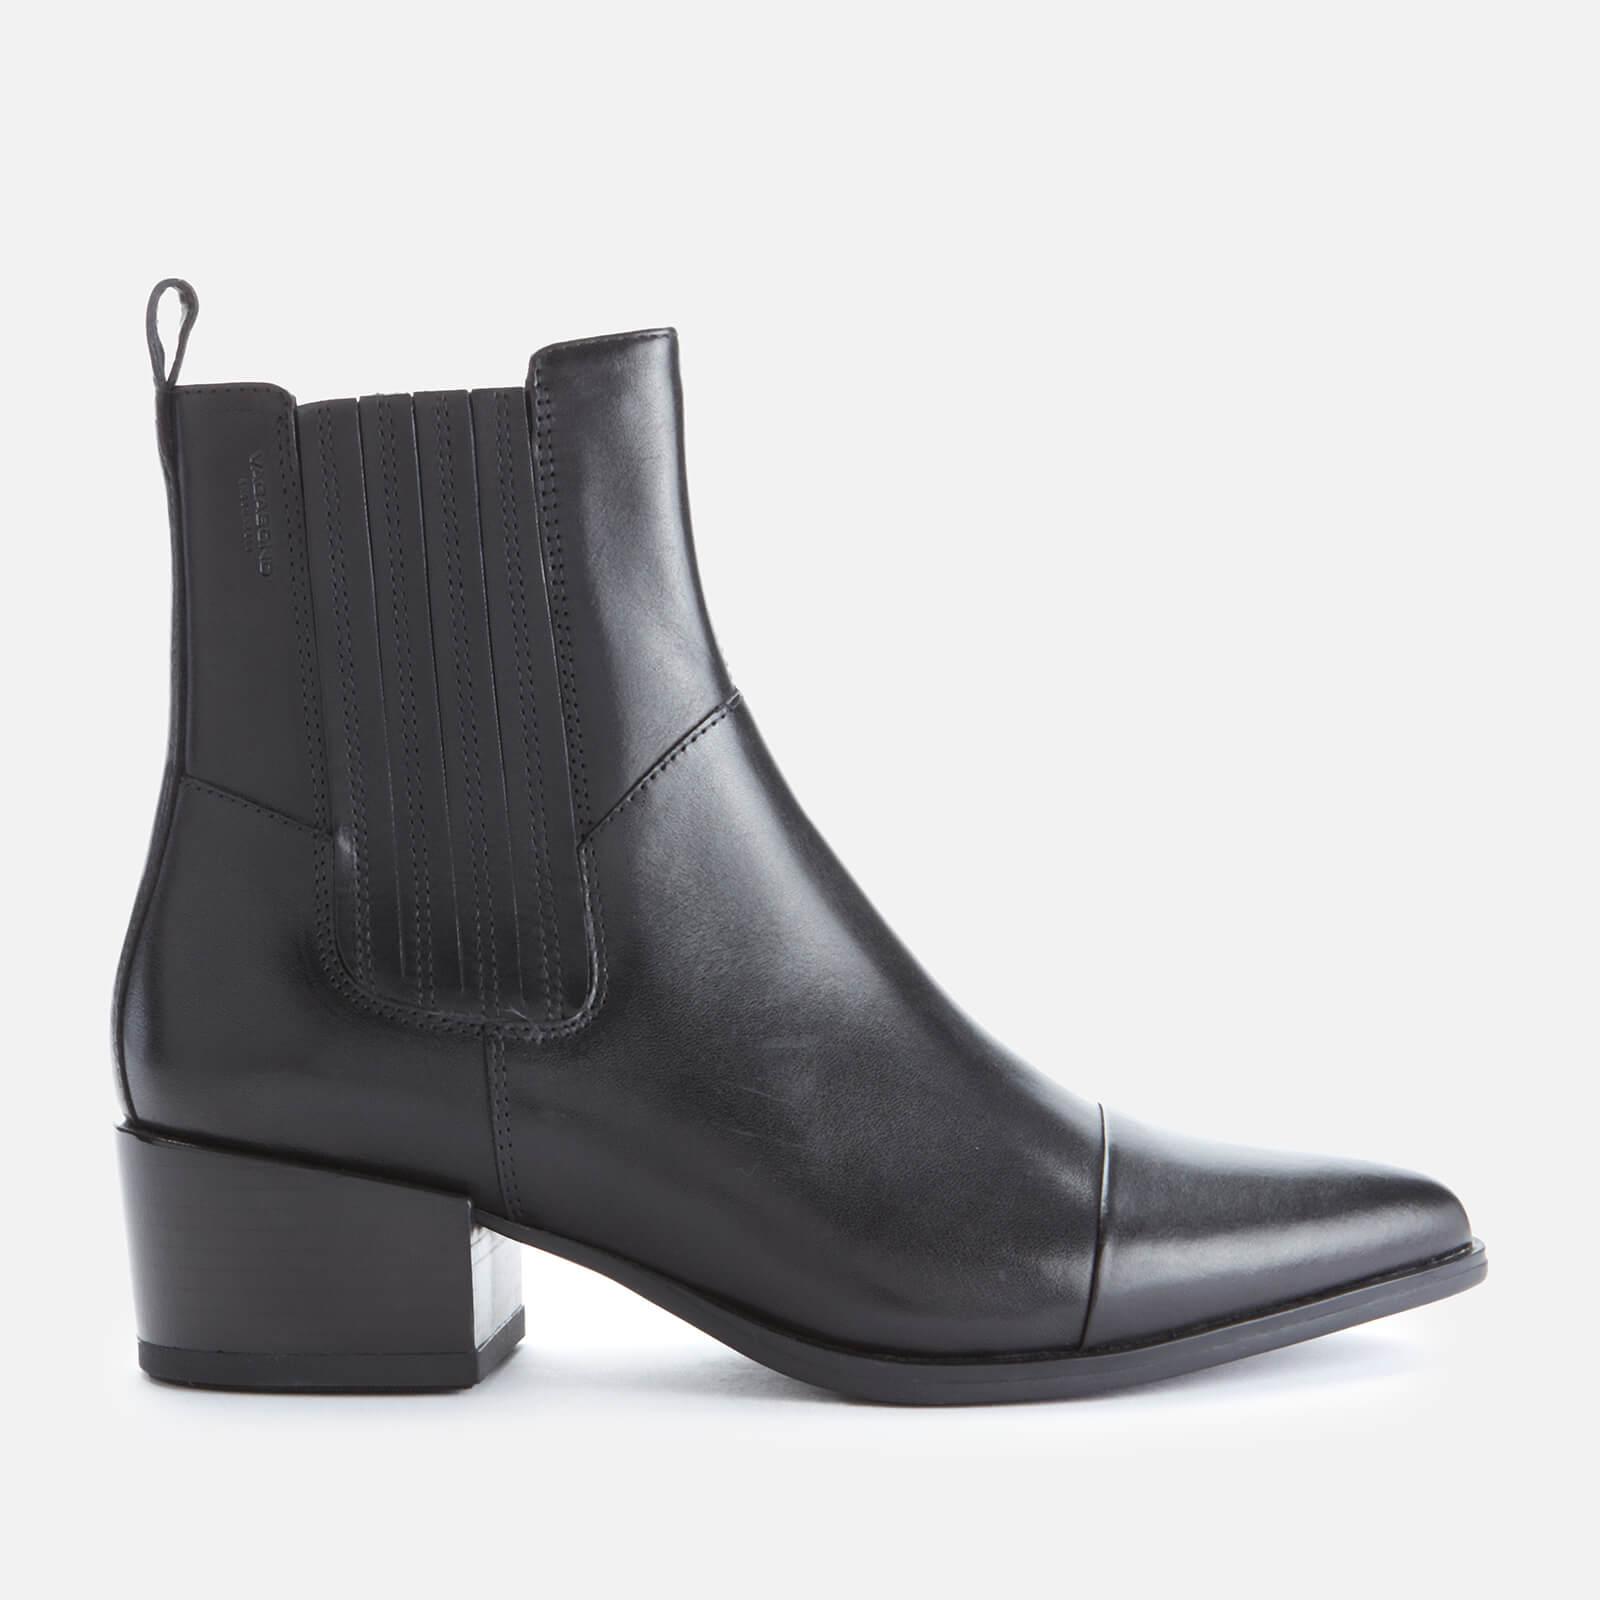 Vagabond Women's Marja Leather Western Boots - Black - Uk 4